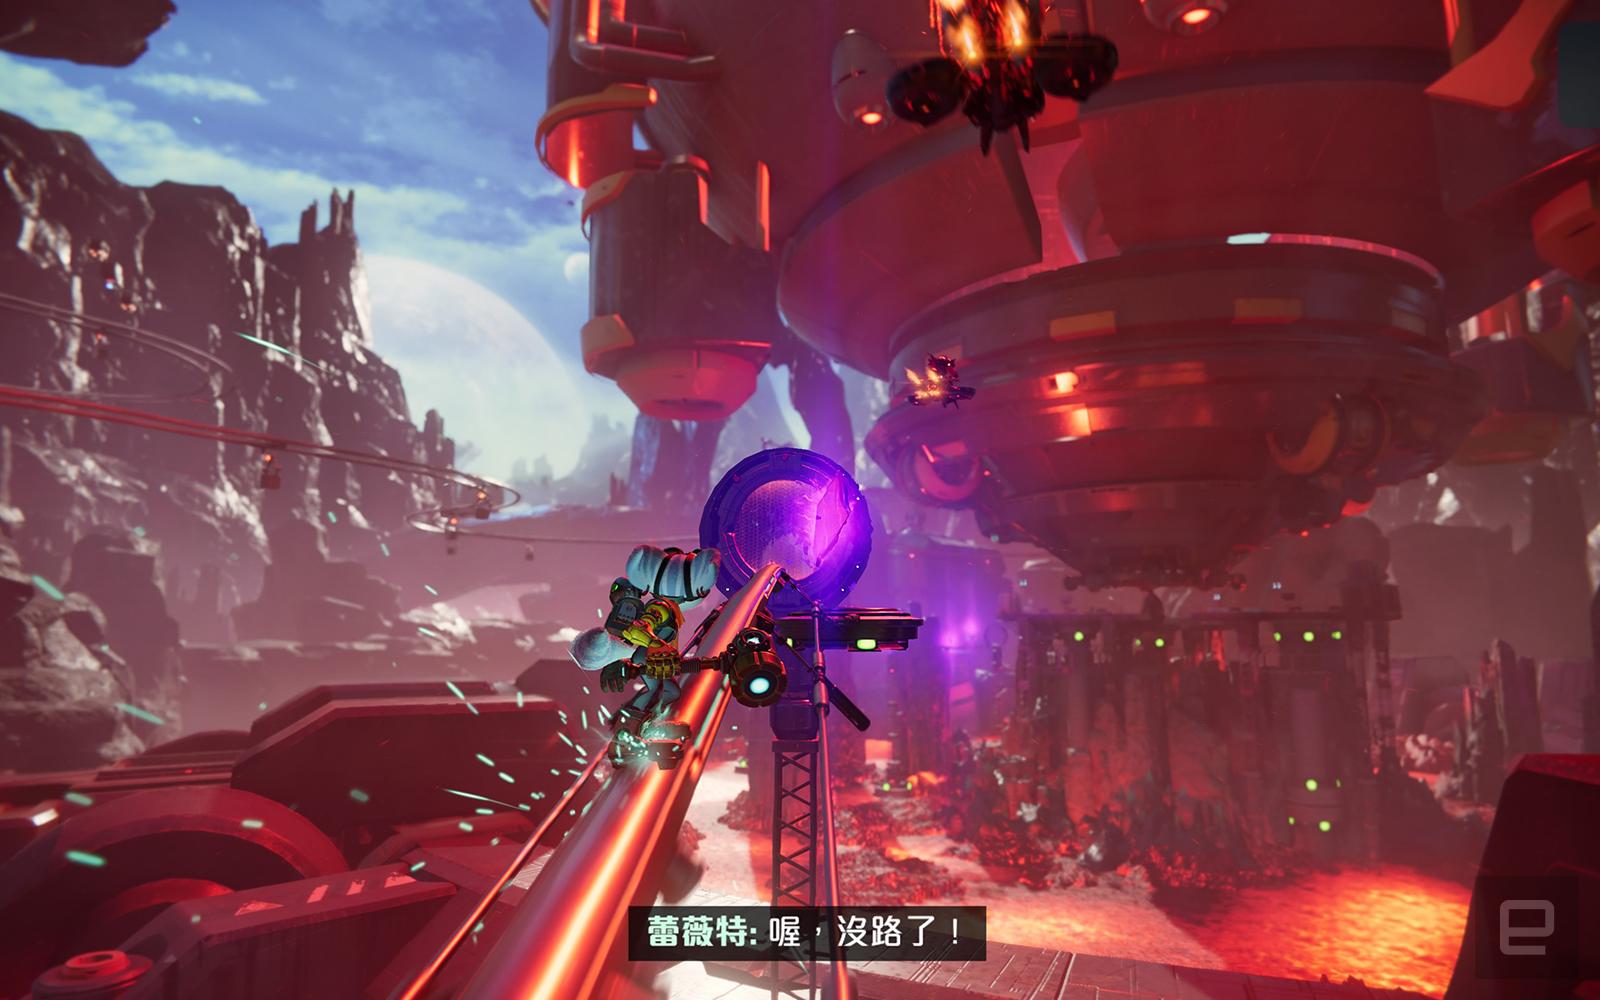 Ratchet & Clank Rift Apart Planet 5